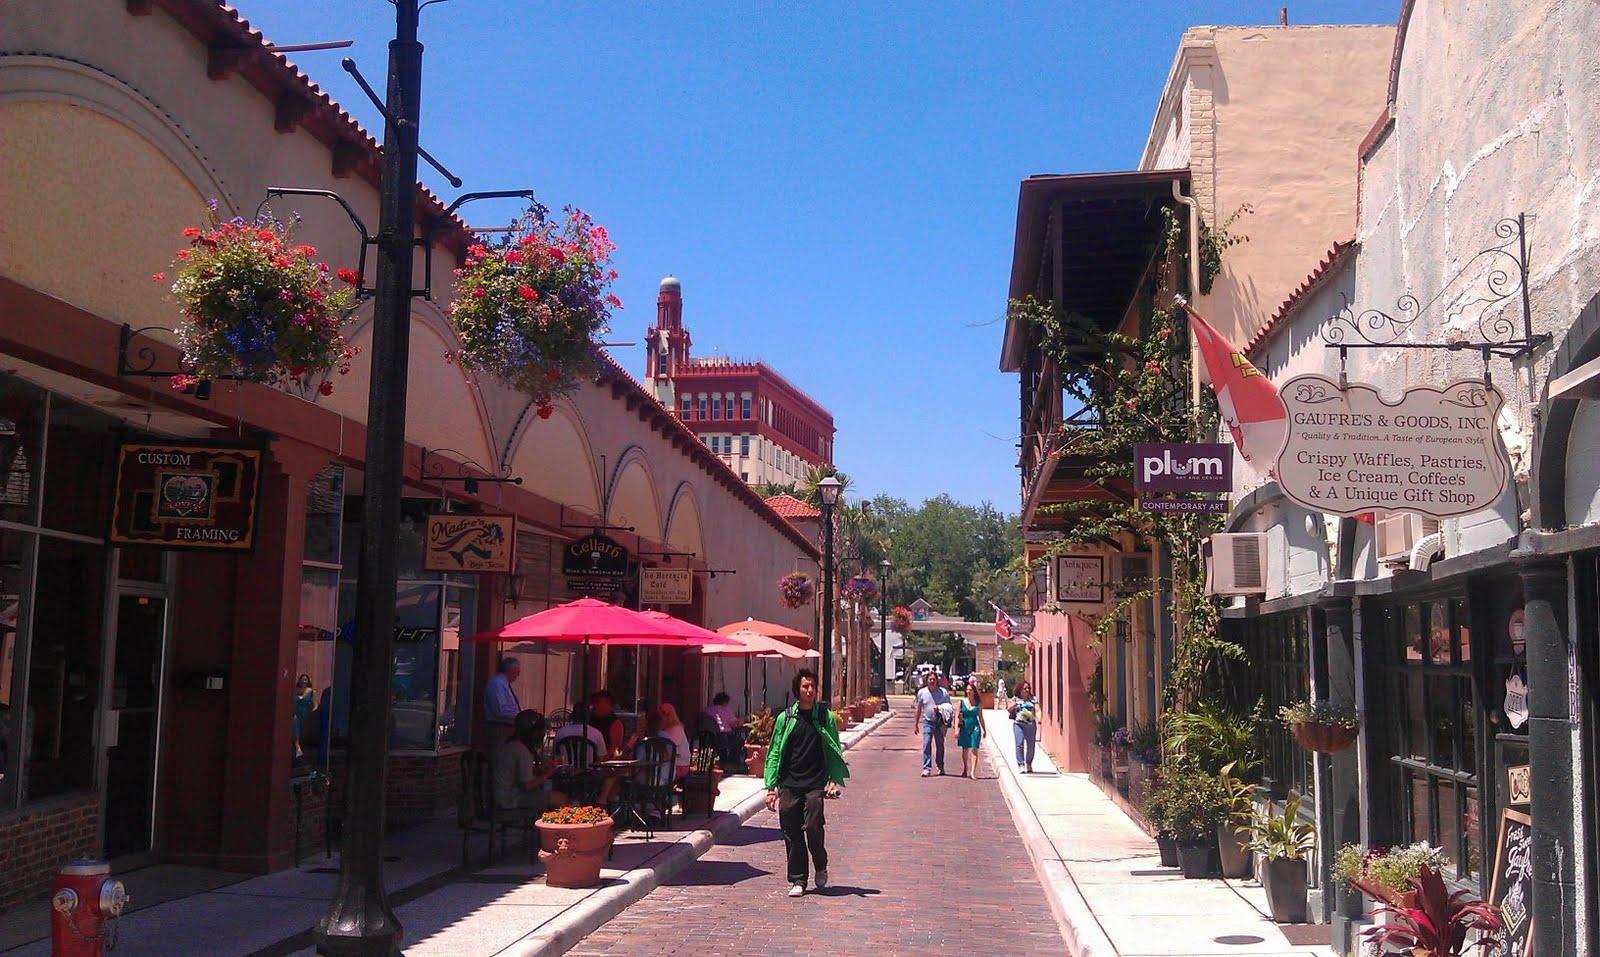 Good Day Sunshine Old Florida Village : Rvburg community in motion st augustine fl day trip